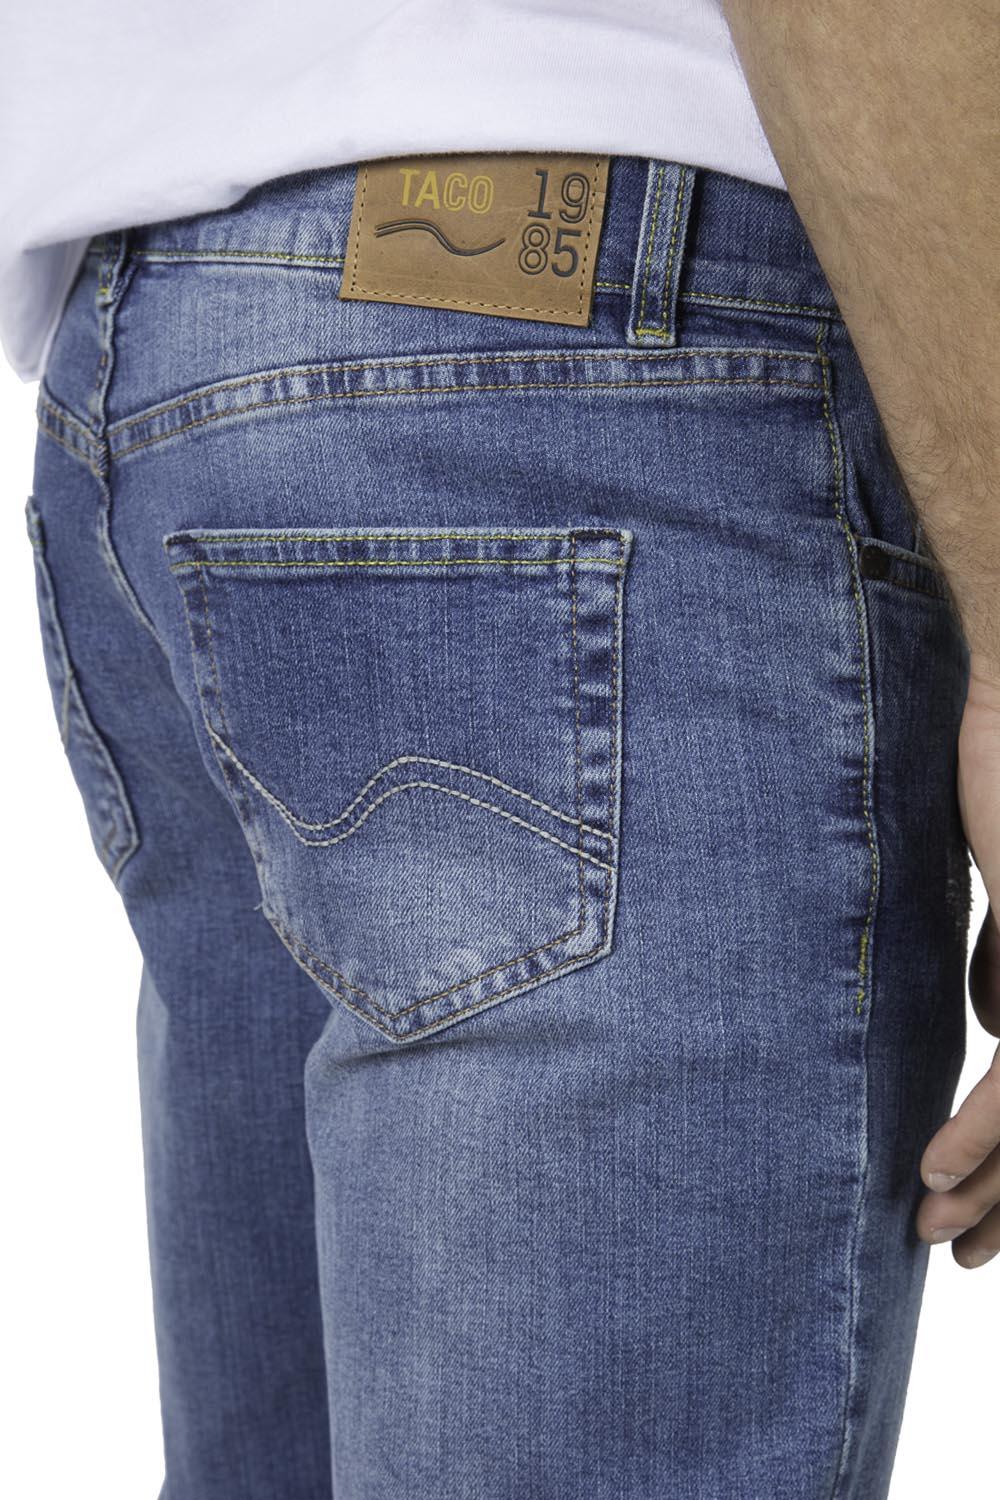 39195169cb Calça Jeans Reta Vintage Destroyer - Taco